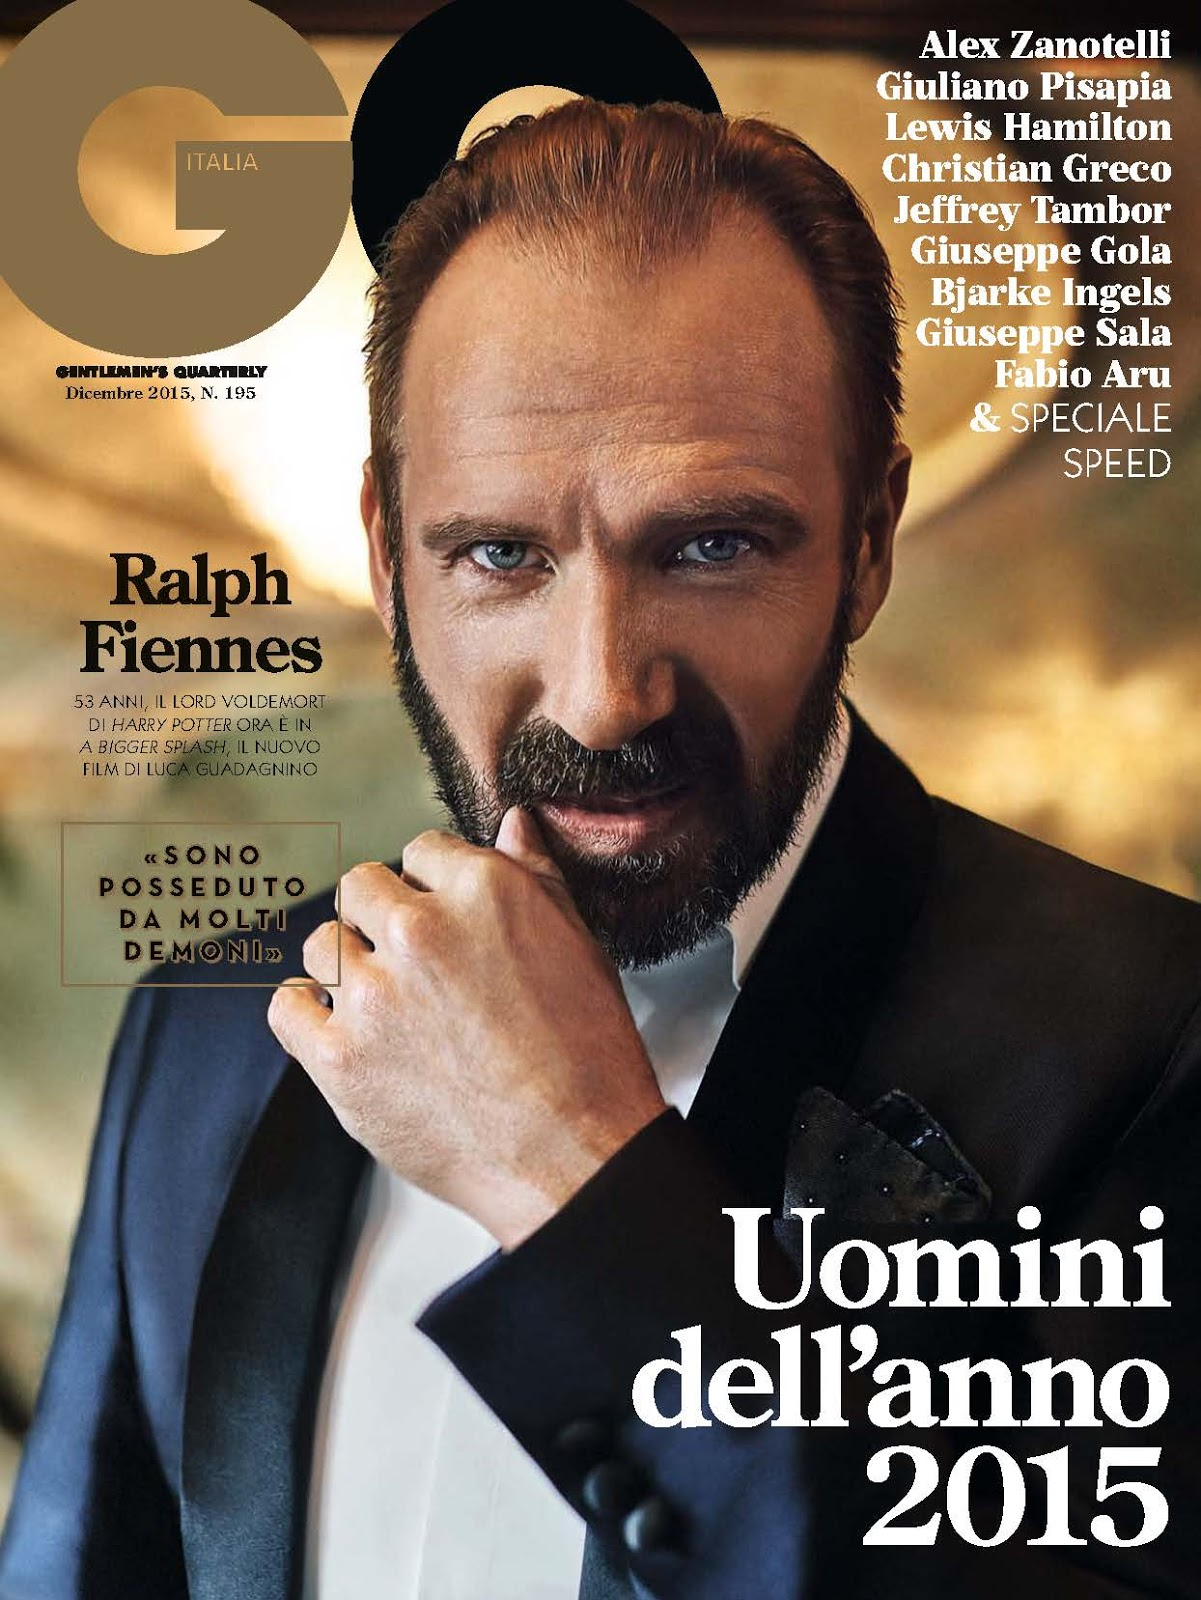 "GQ Italia December 2015 ""Ralph Fiennes"" | Francesco Bertola | GQ Italia | Andrea Tenerani | Numerique Retouch Photo Retouching Studio"